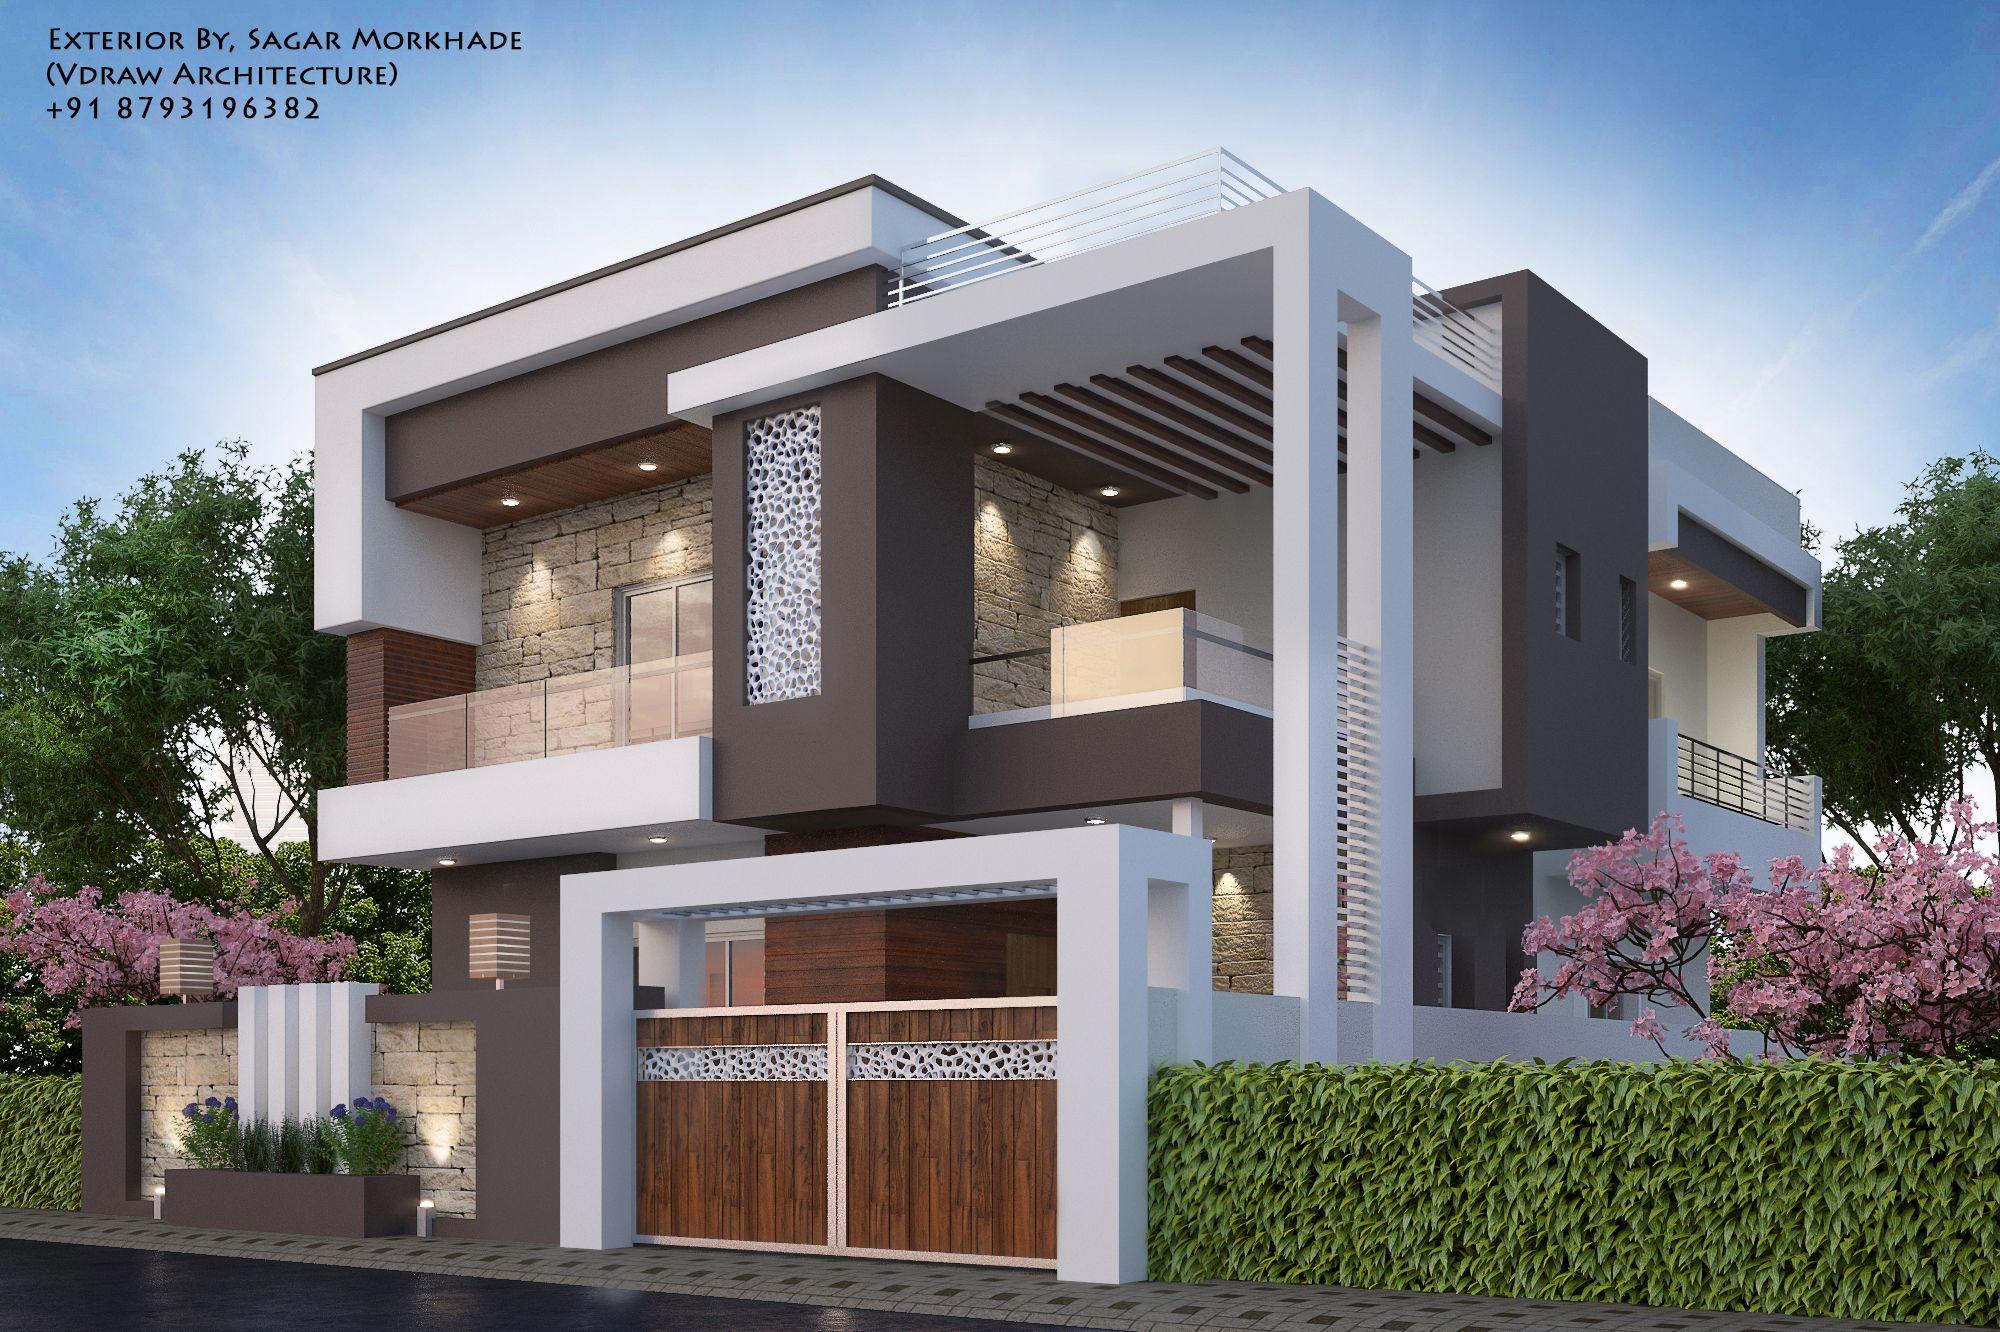 Modern house exterior by sagar morkhade vdraw architecture